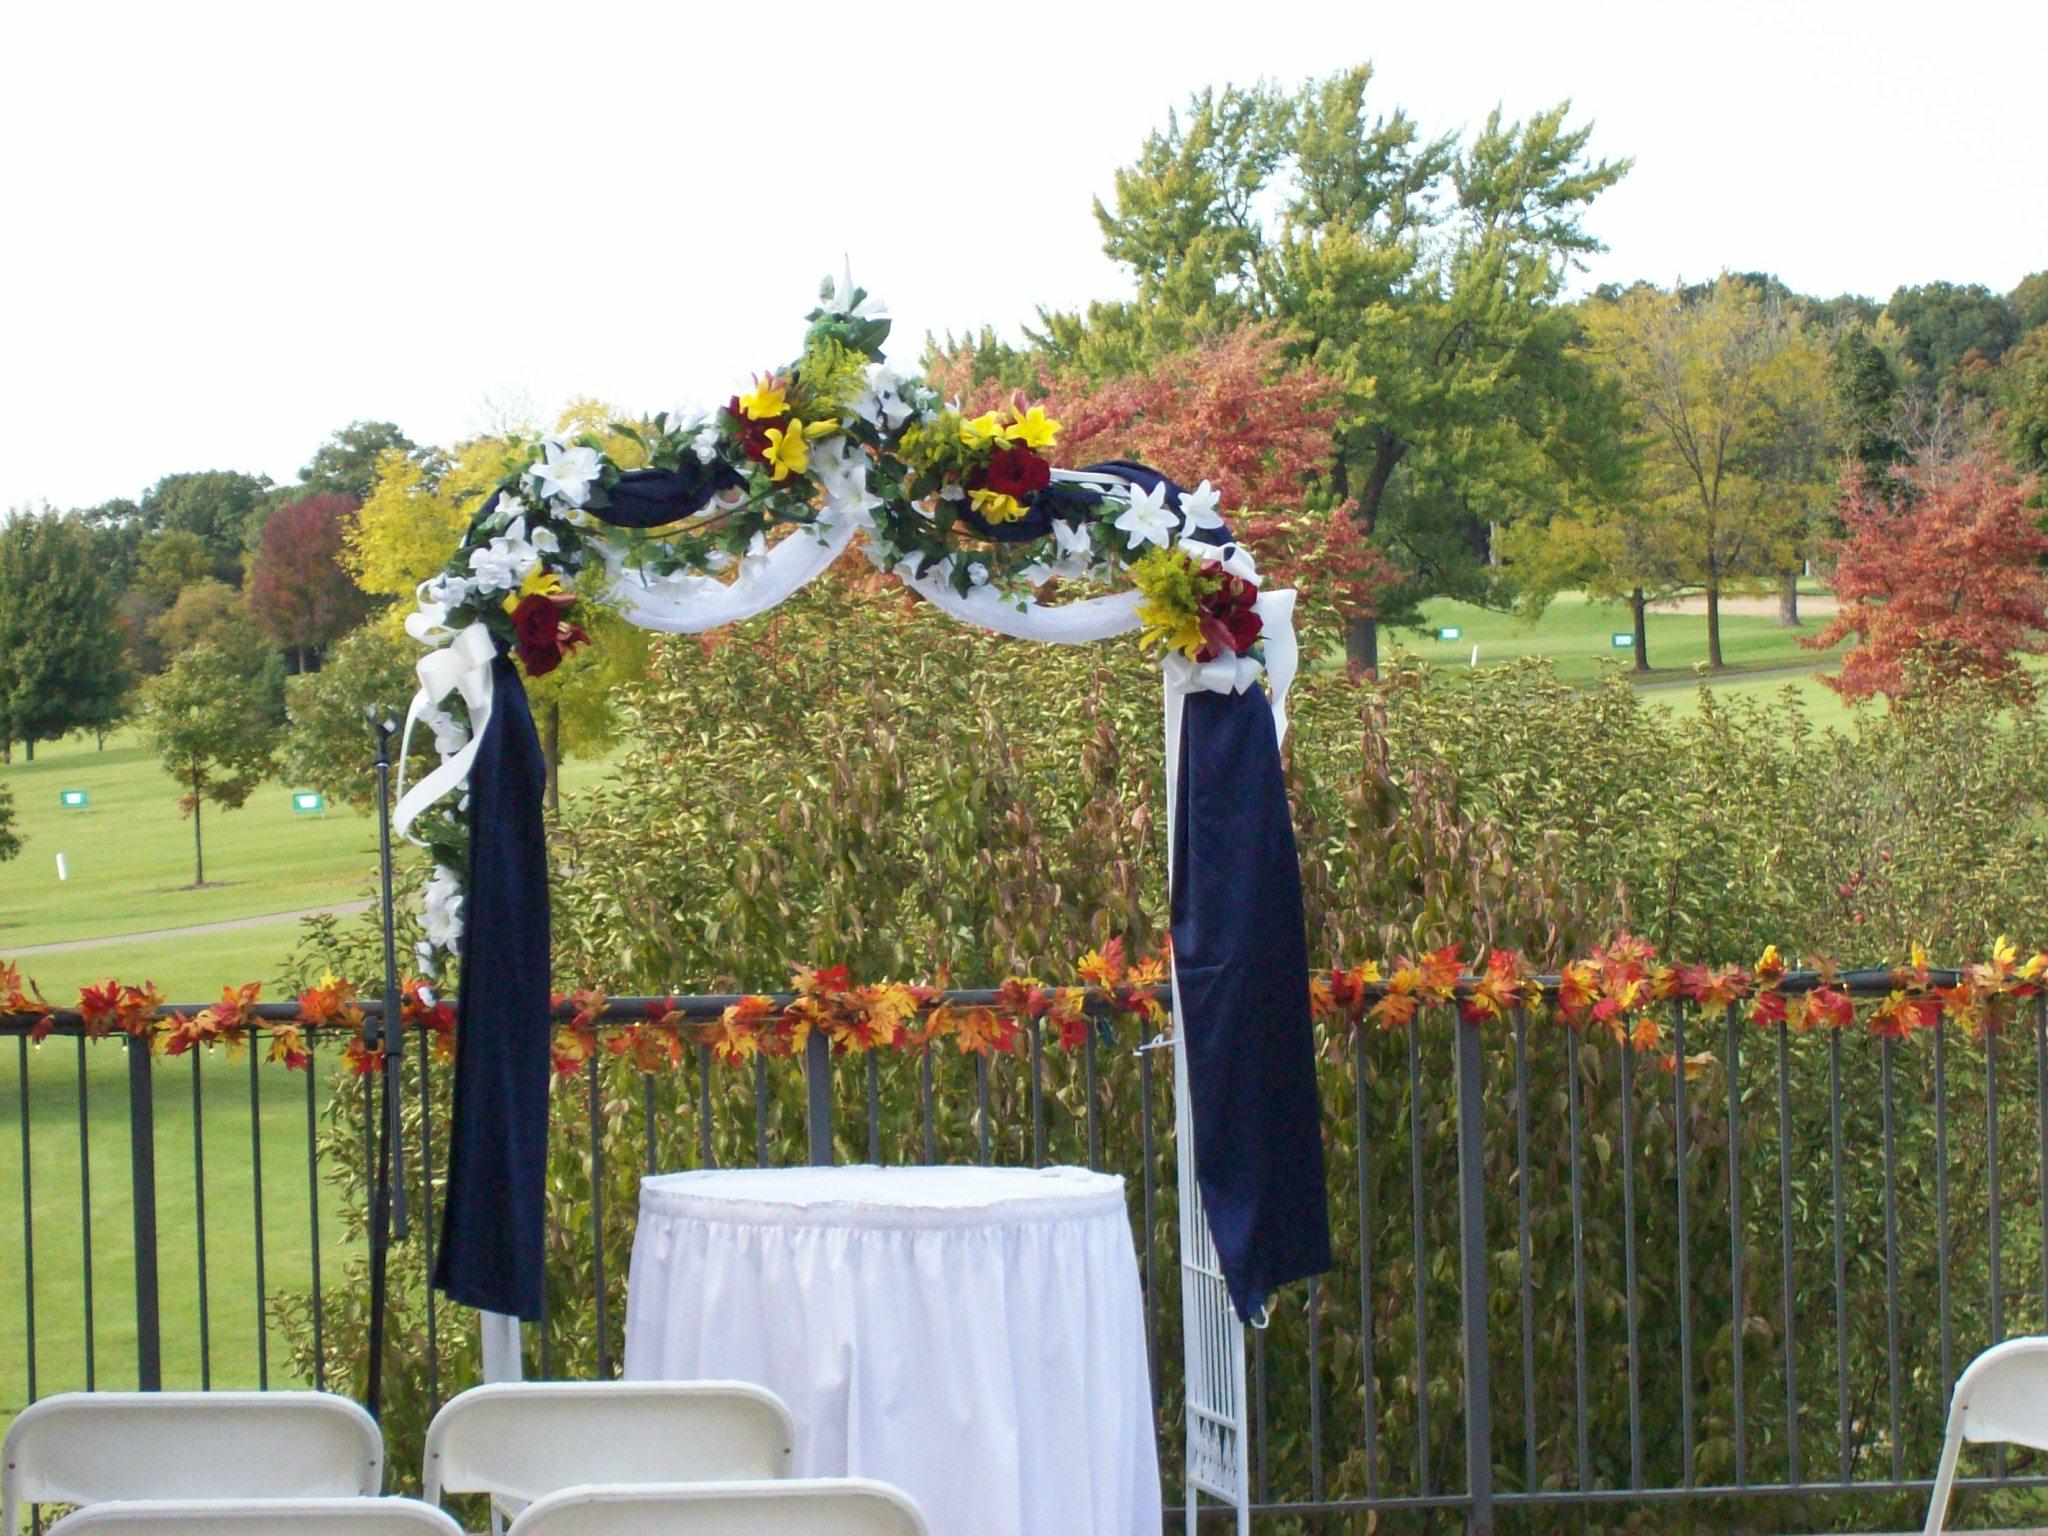 Decorating A Trellis For A Wedding Outdoor Wedding Ceremonies Bartletthillsweddingblog